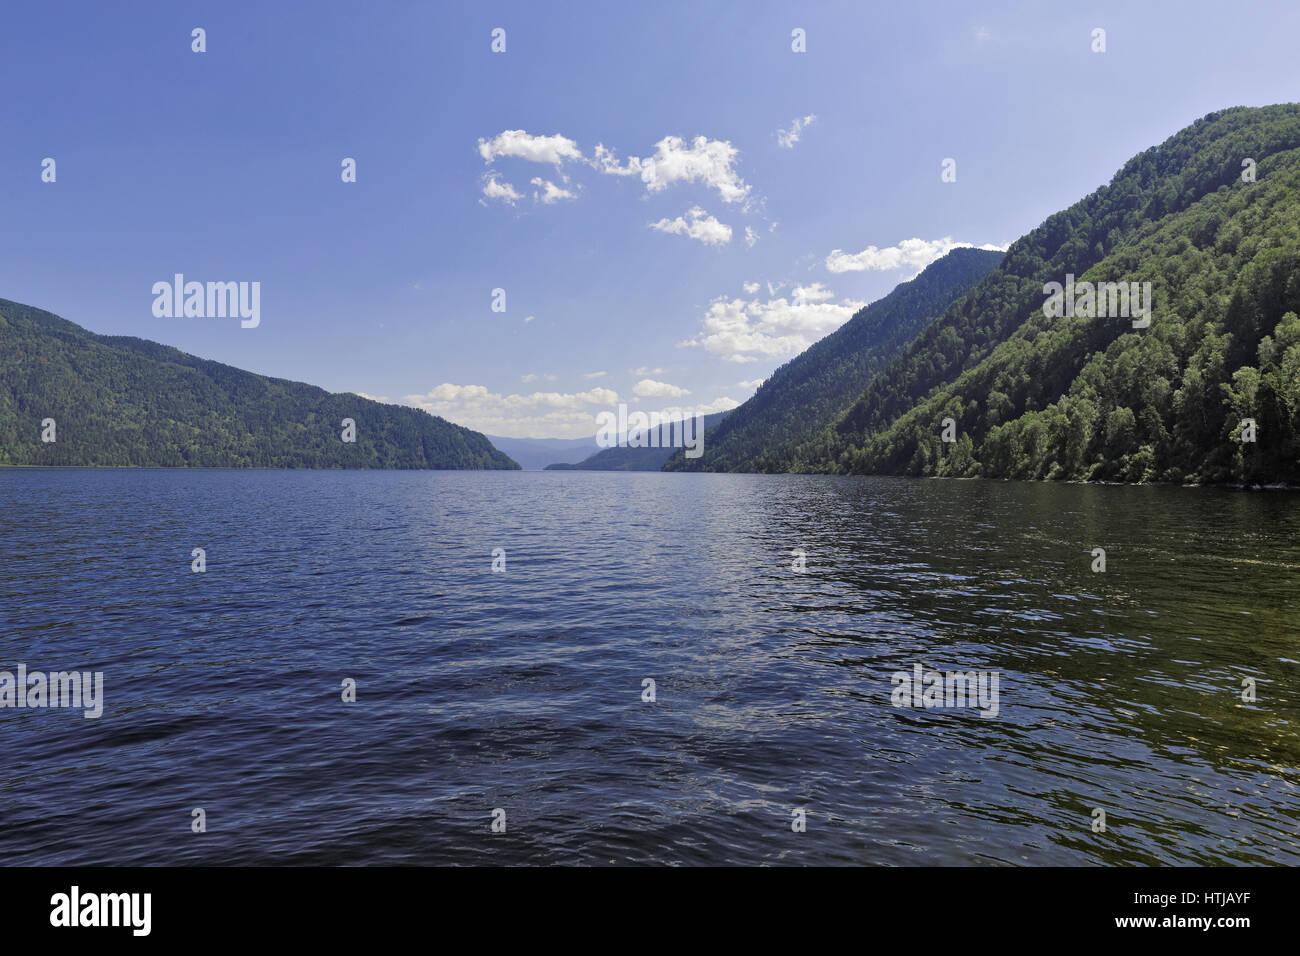 Russia, Siberia, Altai, a view of the waters of Lake Teletskoye Stock Photo